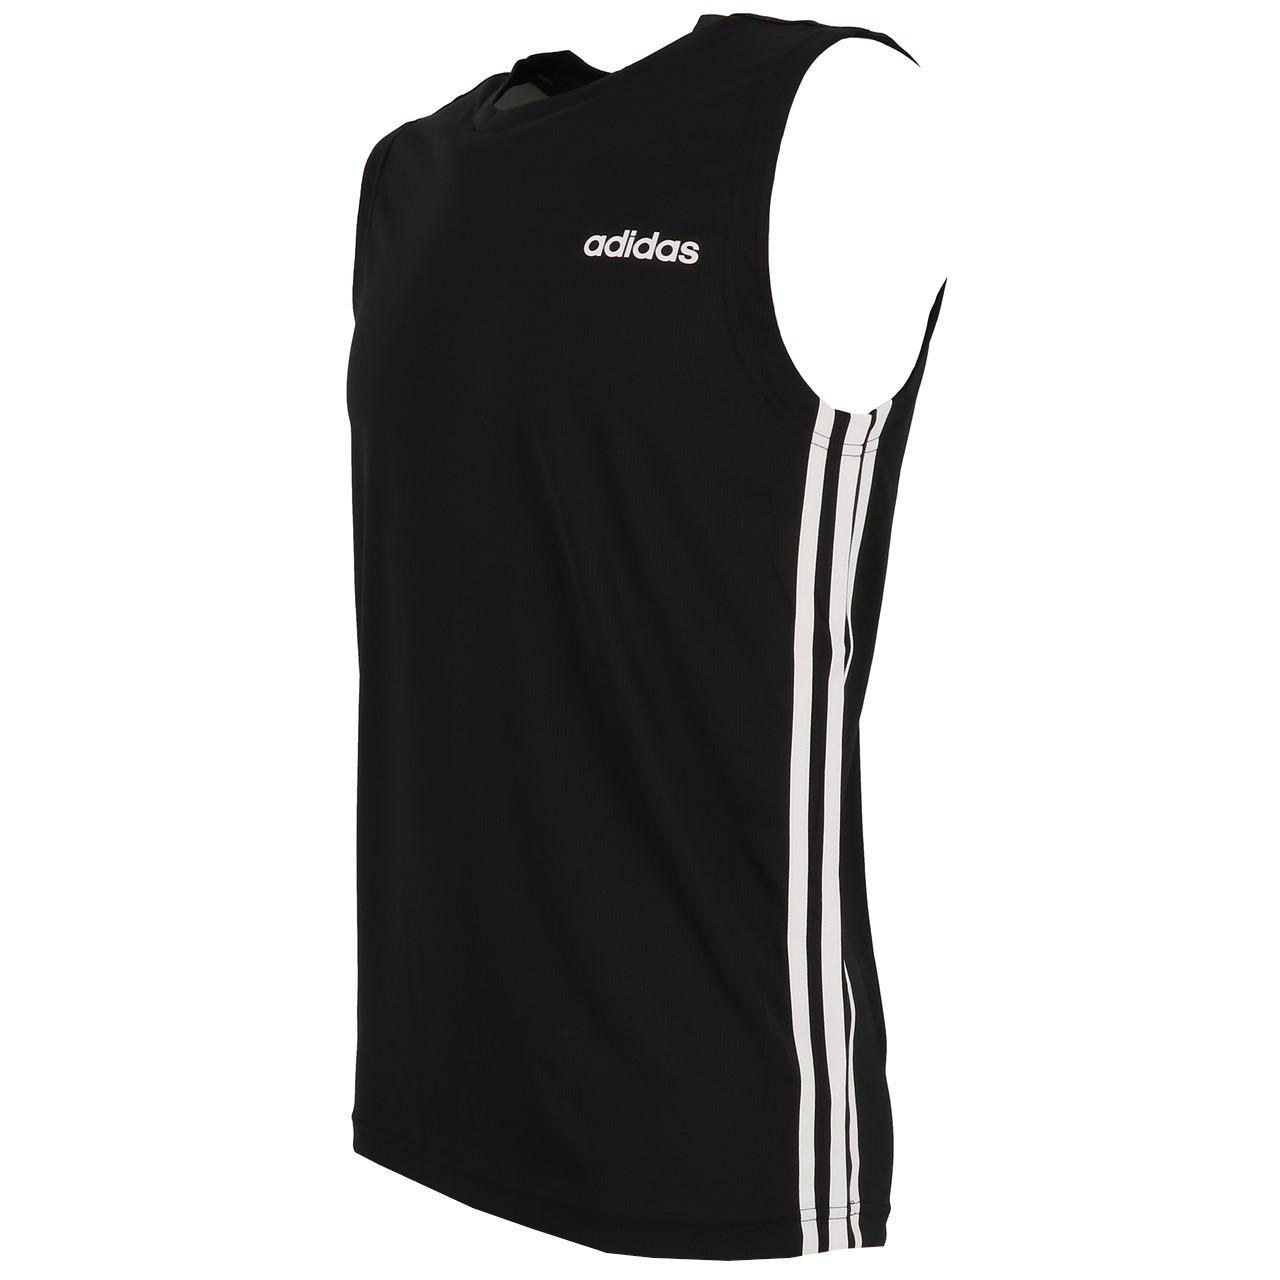 Sleeveless-Shirt-Adidas-D2m-Sl-3s-Blk-Sm-Tee-Black-90912-New thumbnail 4